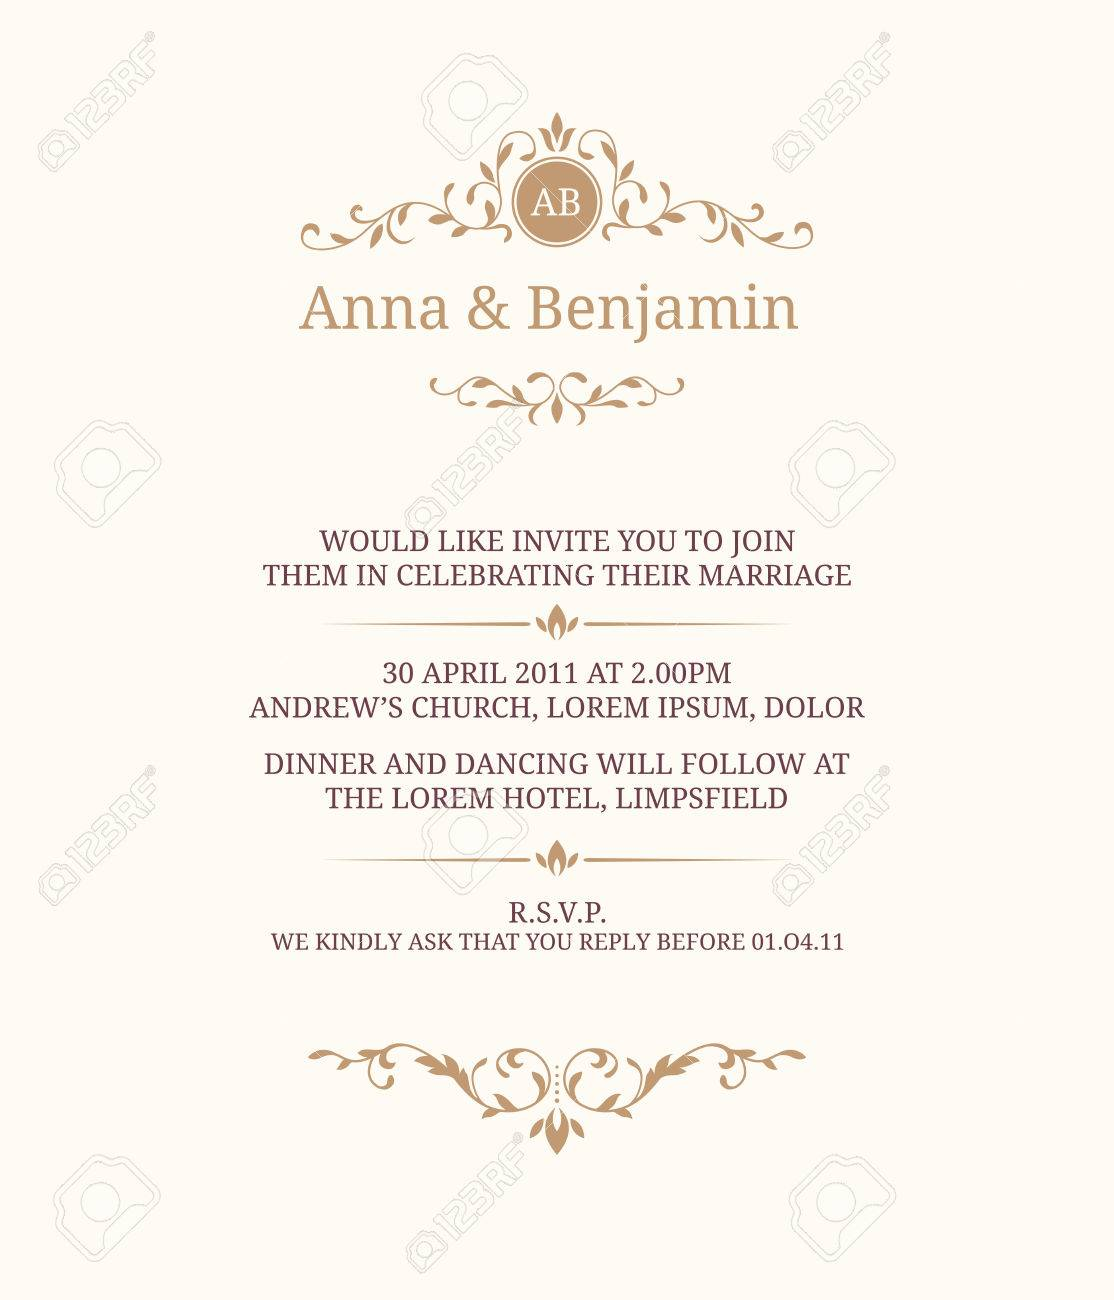 Invitation Card With Monogram. Wedding Invitation, Save The Date ...